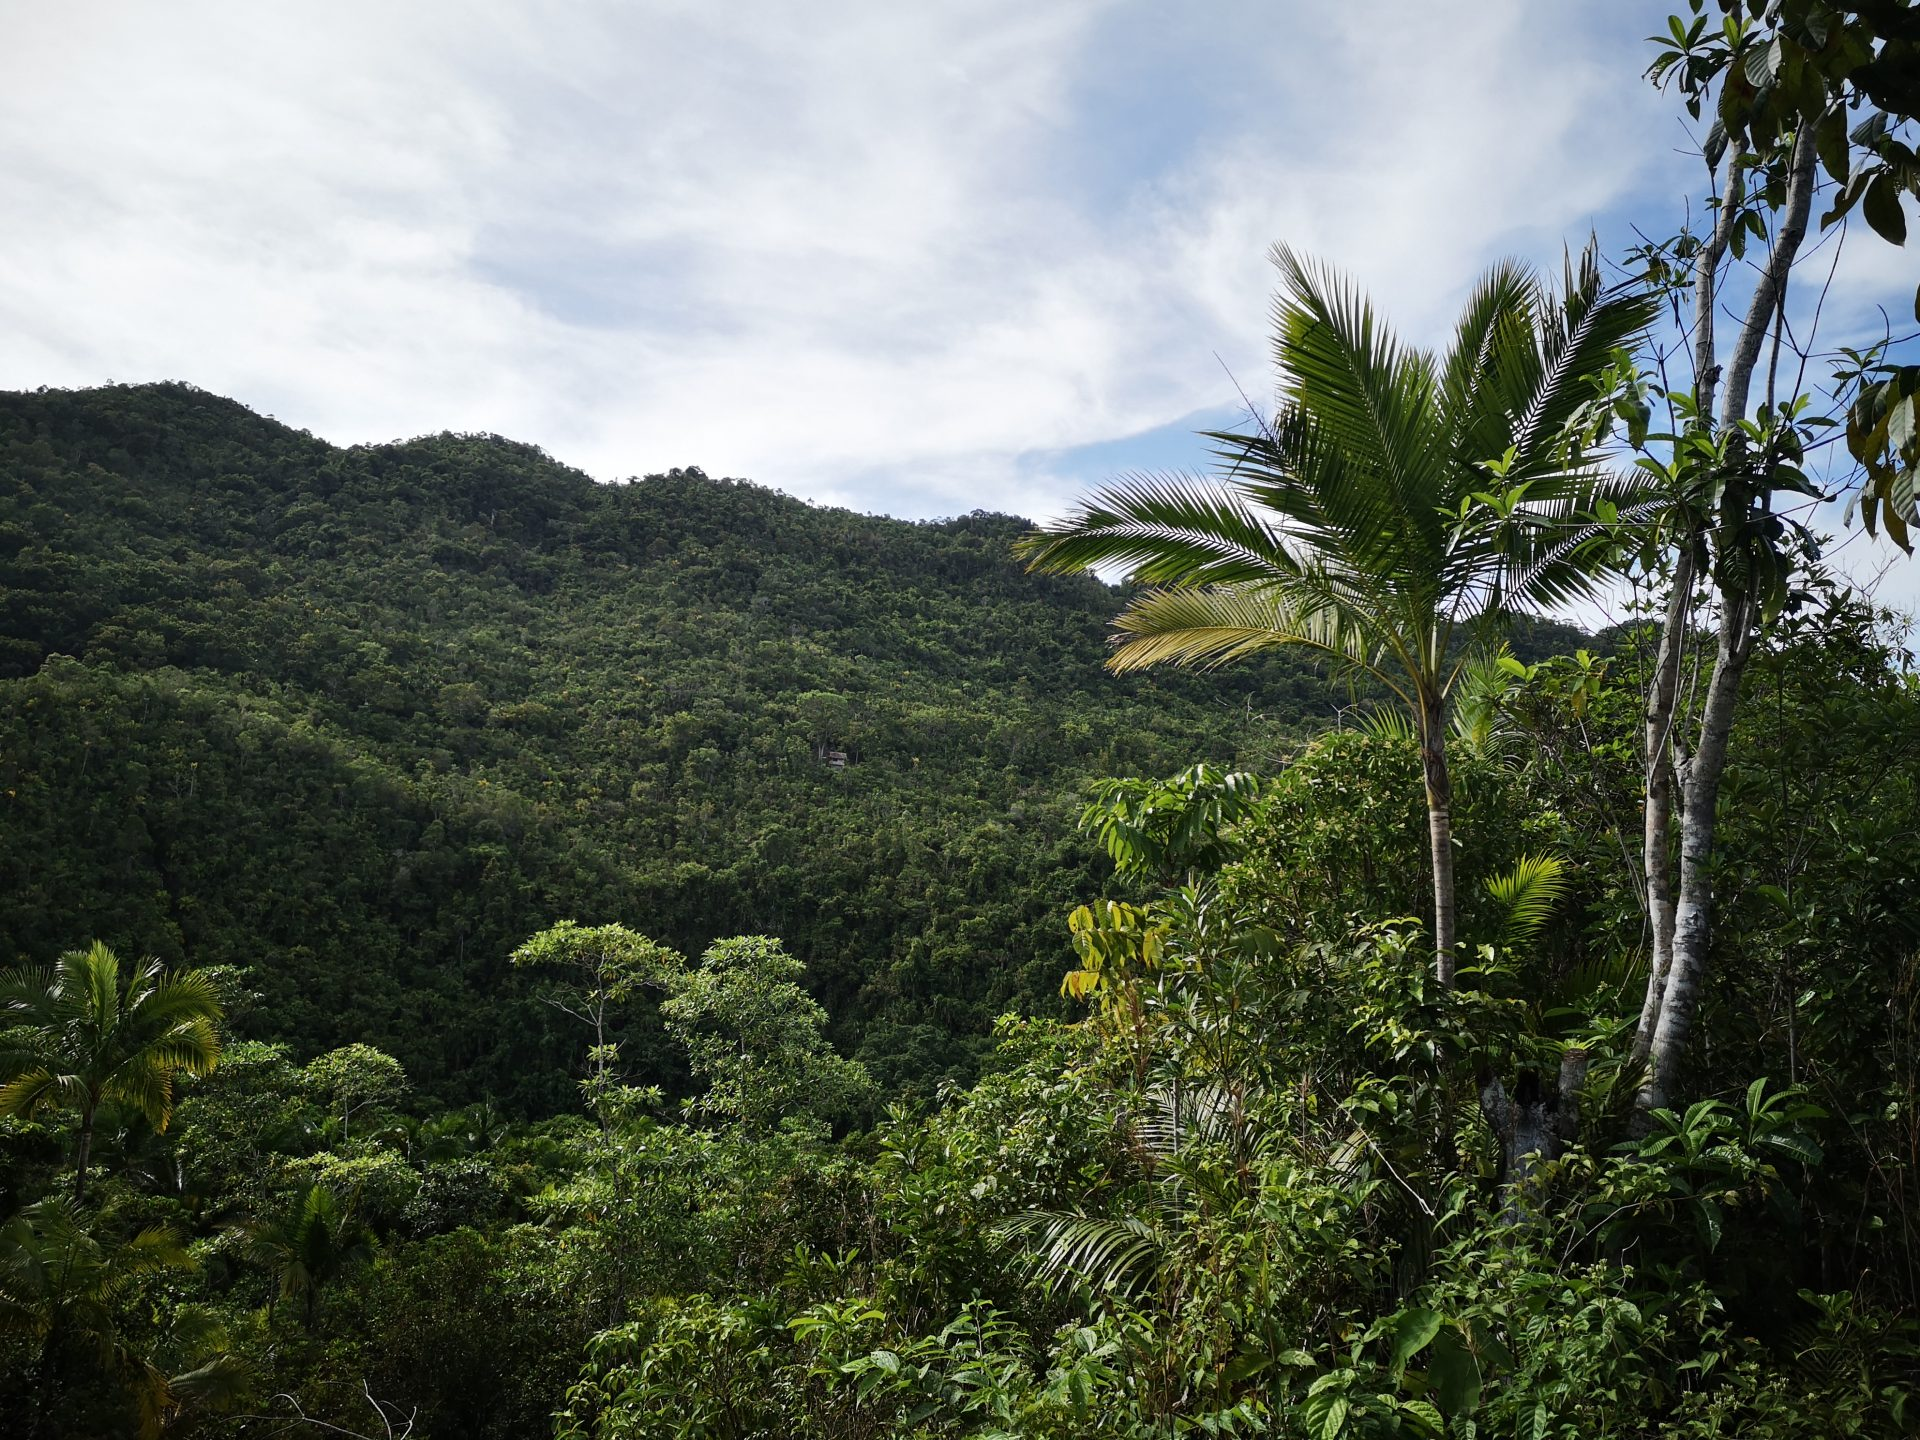 Bohol – Loboc River & Rajah Sikatuna National Park